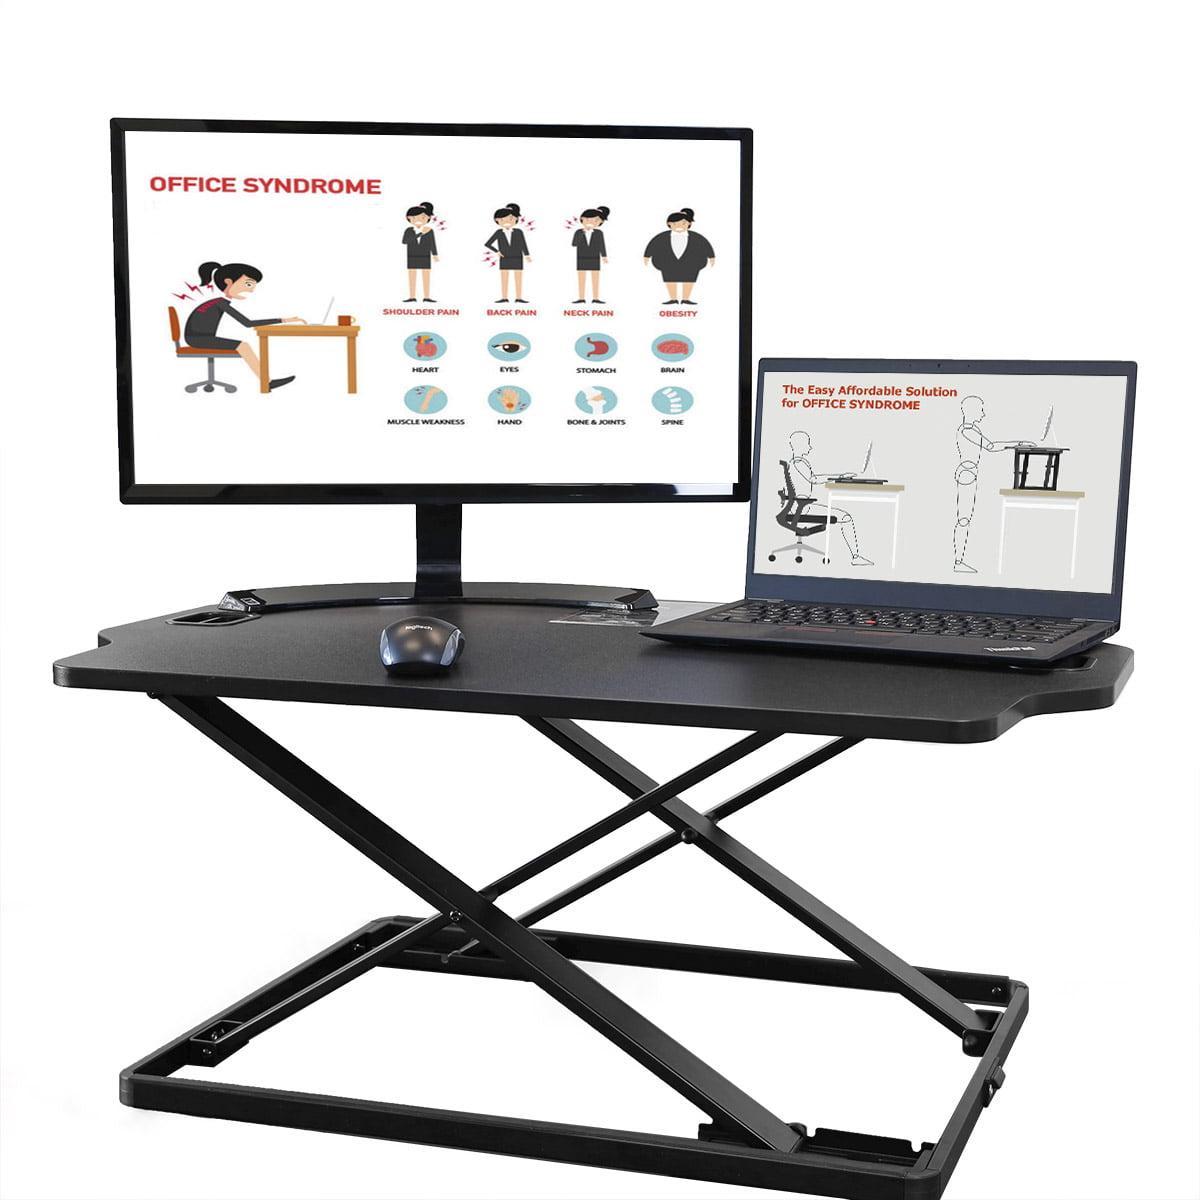 "Advn Up 31""X21"" Standing Desk Converter Height Adjustable Sit Stand Up Workstation by Advn Up"